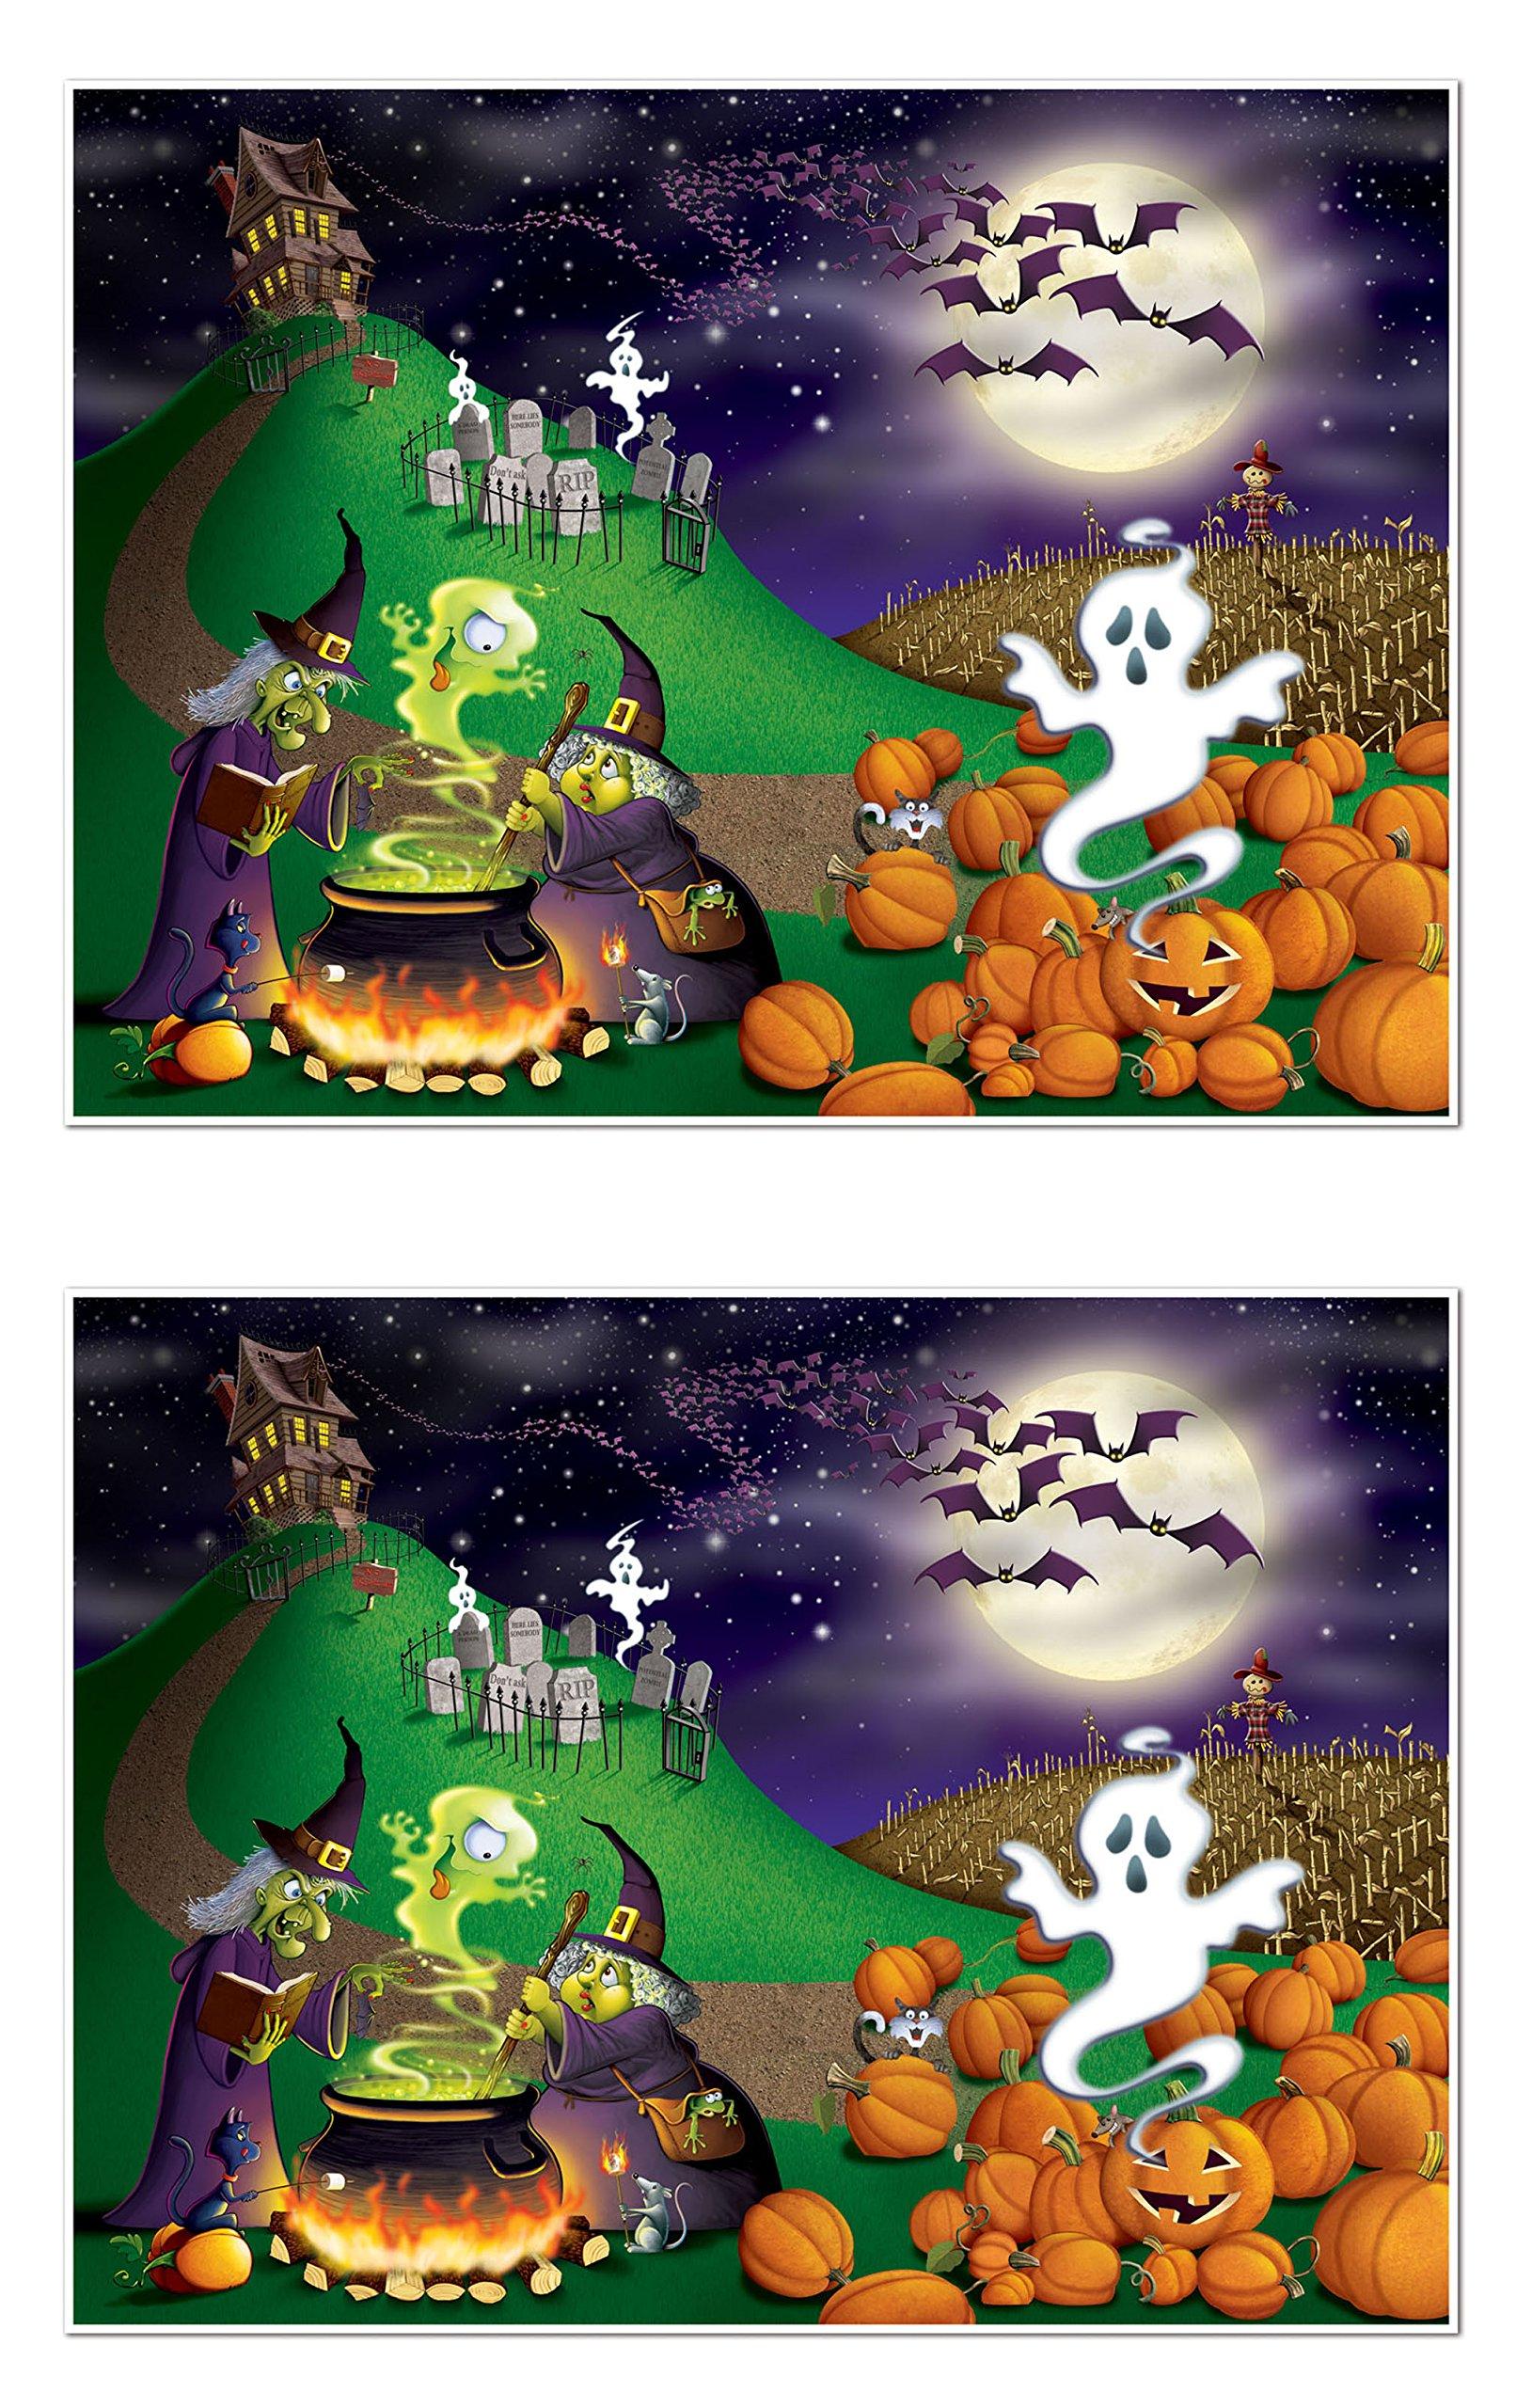 Beistle S00909AZ2 Halloween Insta-Mural 2 Piece, Multicolored by Beistle